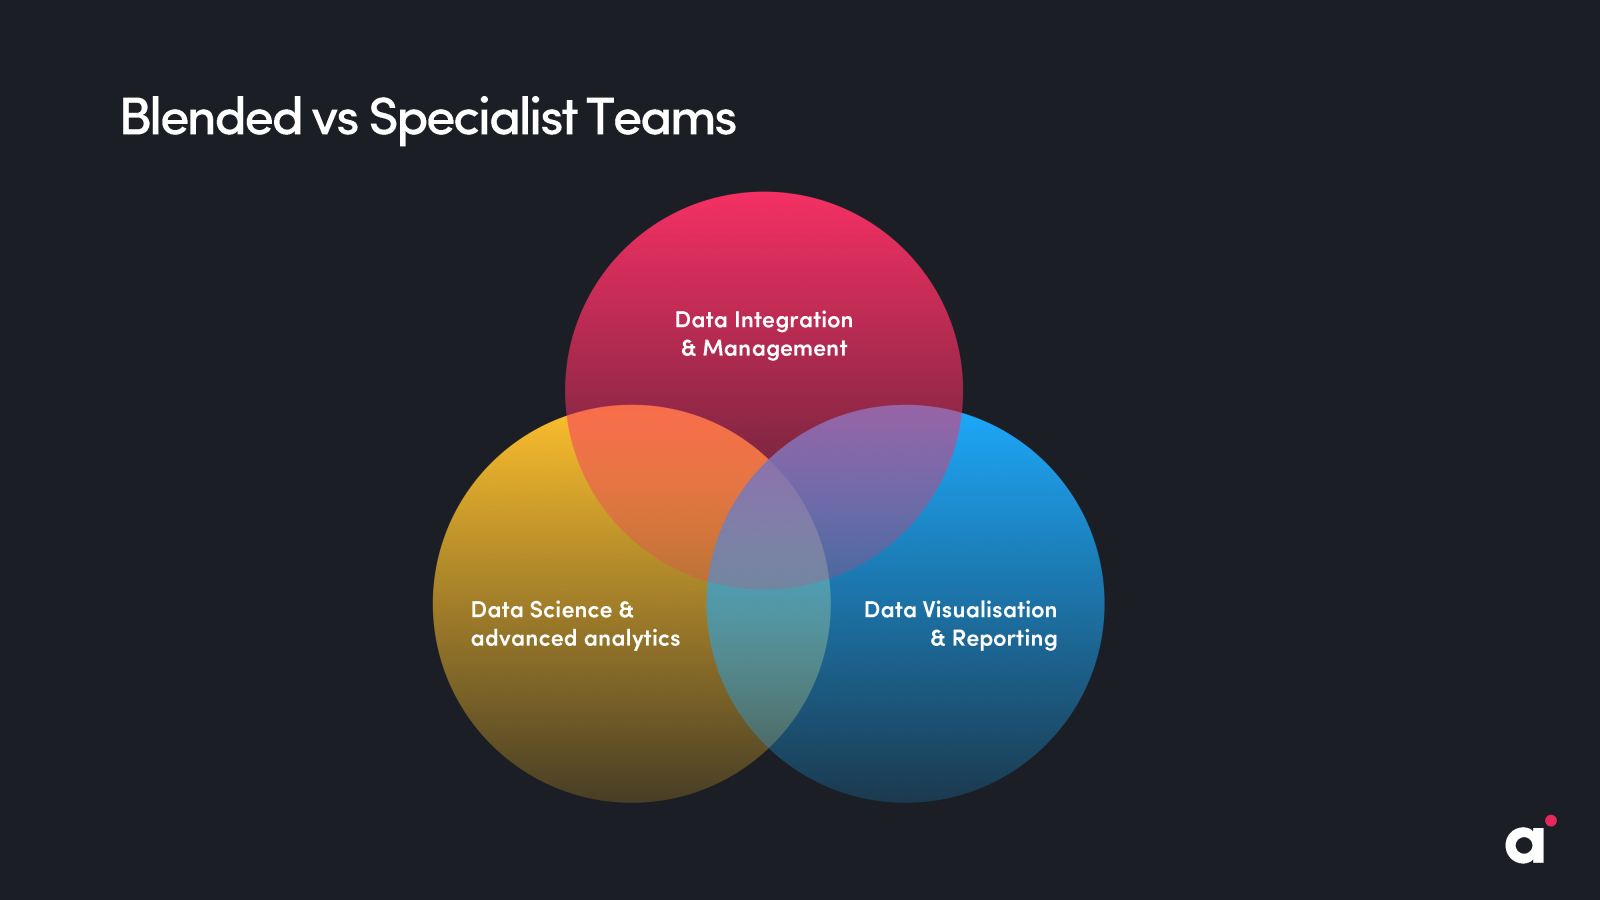 Blended vs specialist data teams